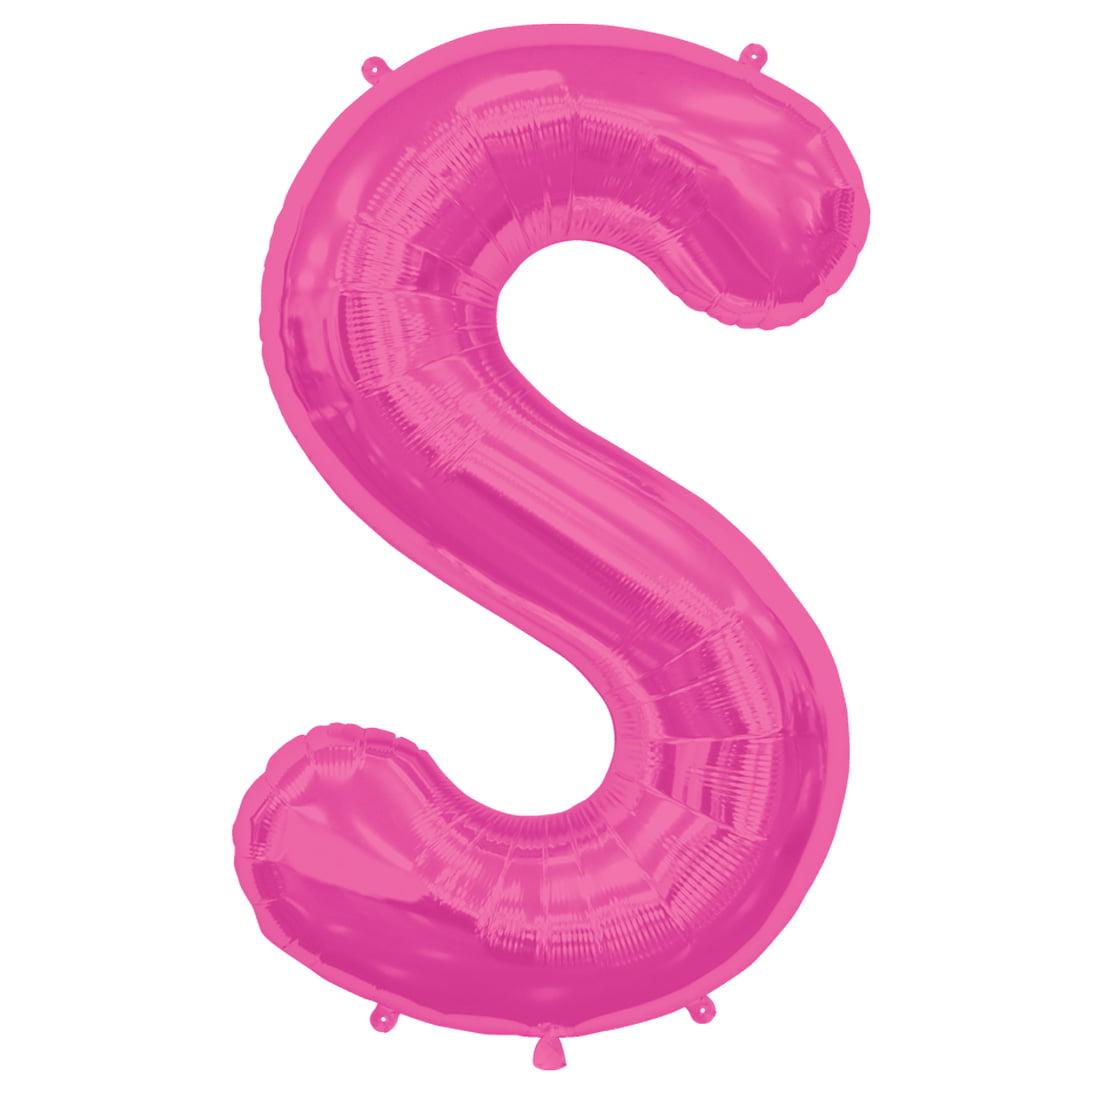 "Northstar Alphabet Letter S Shape Solid Jumbo Helium 34"" Foil Balloon, Magenta"